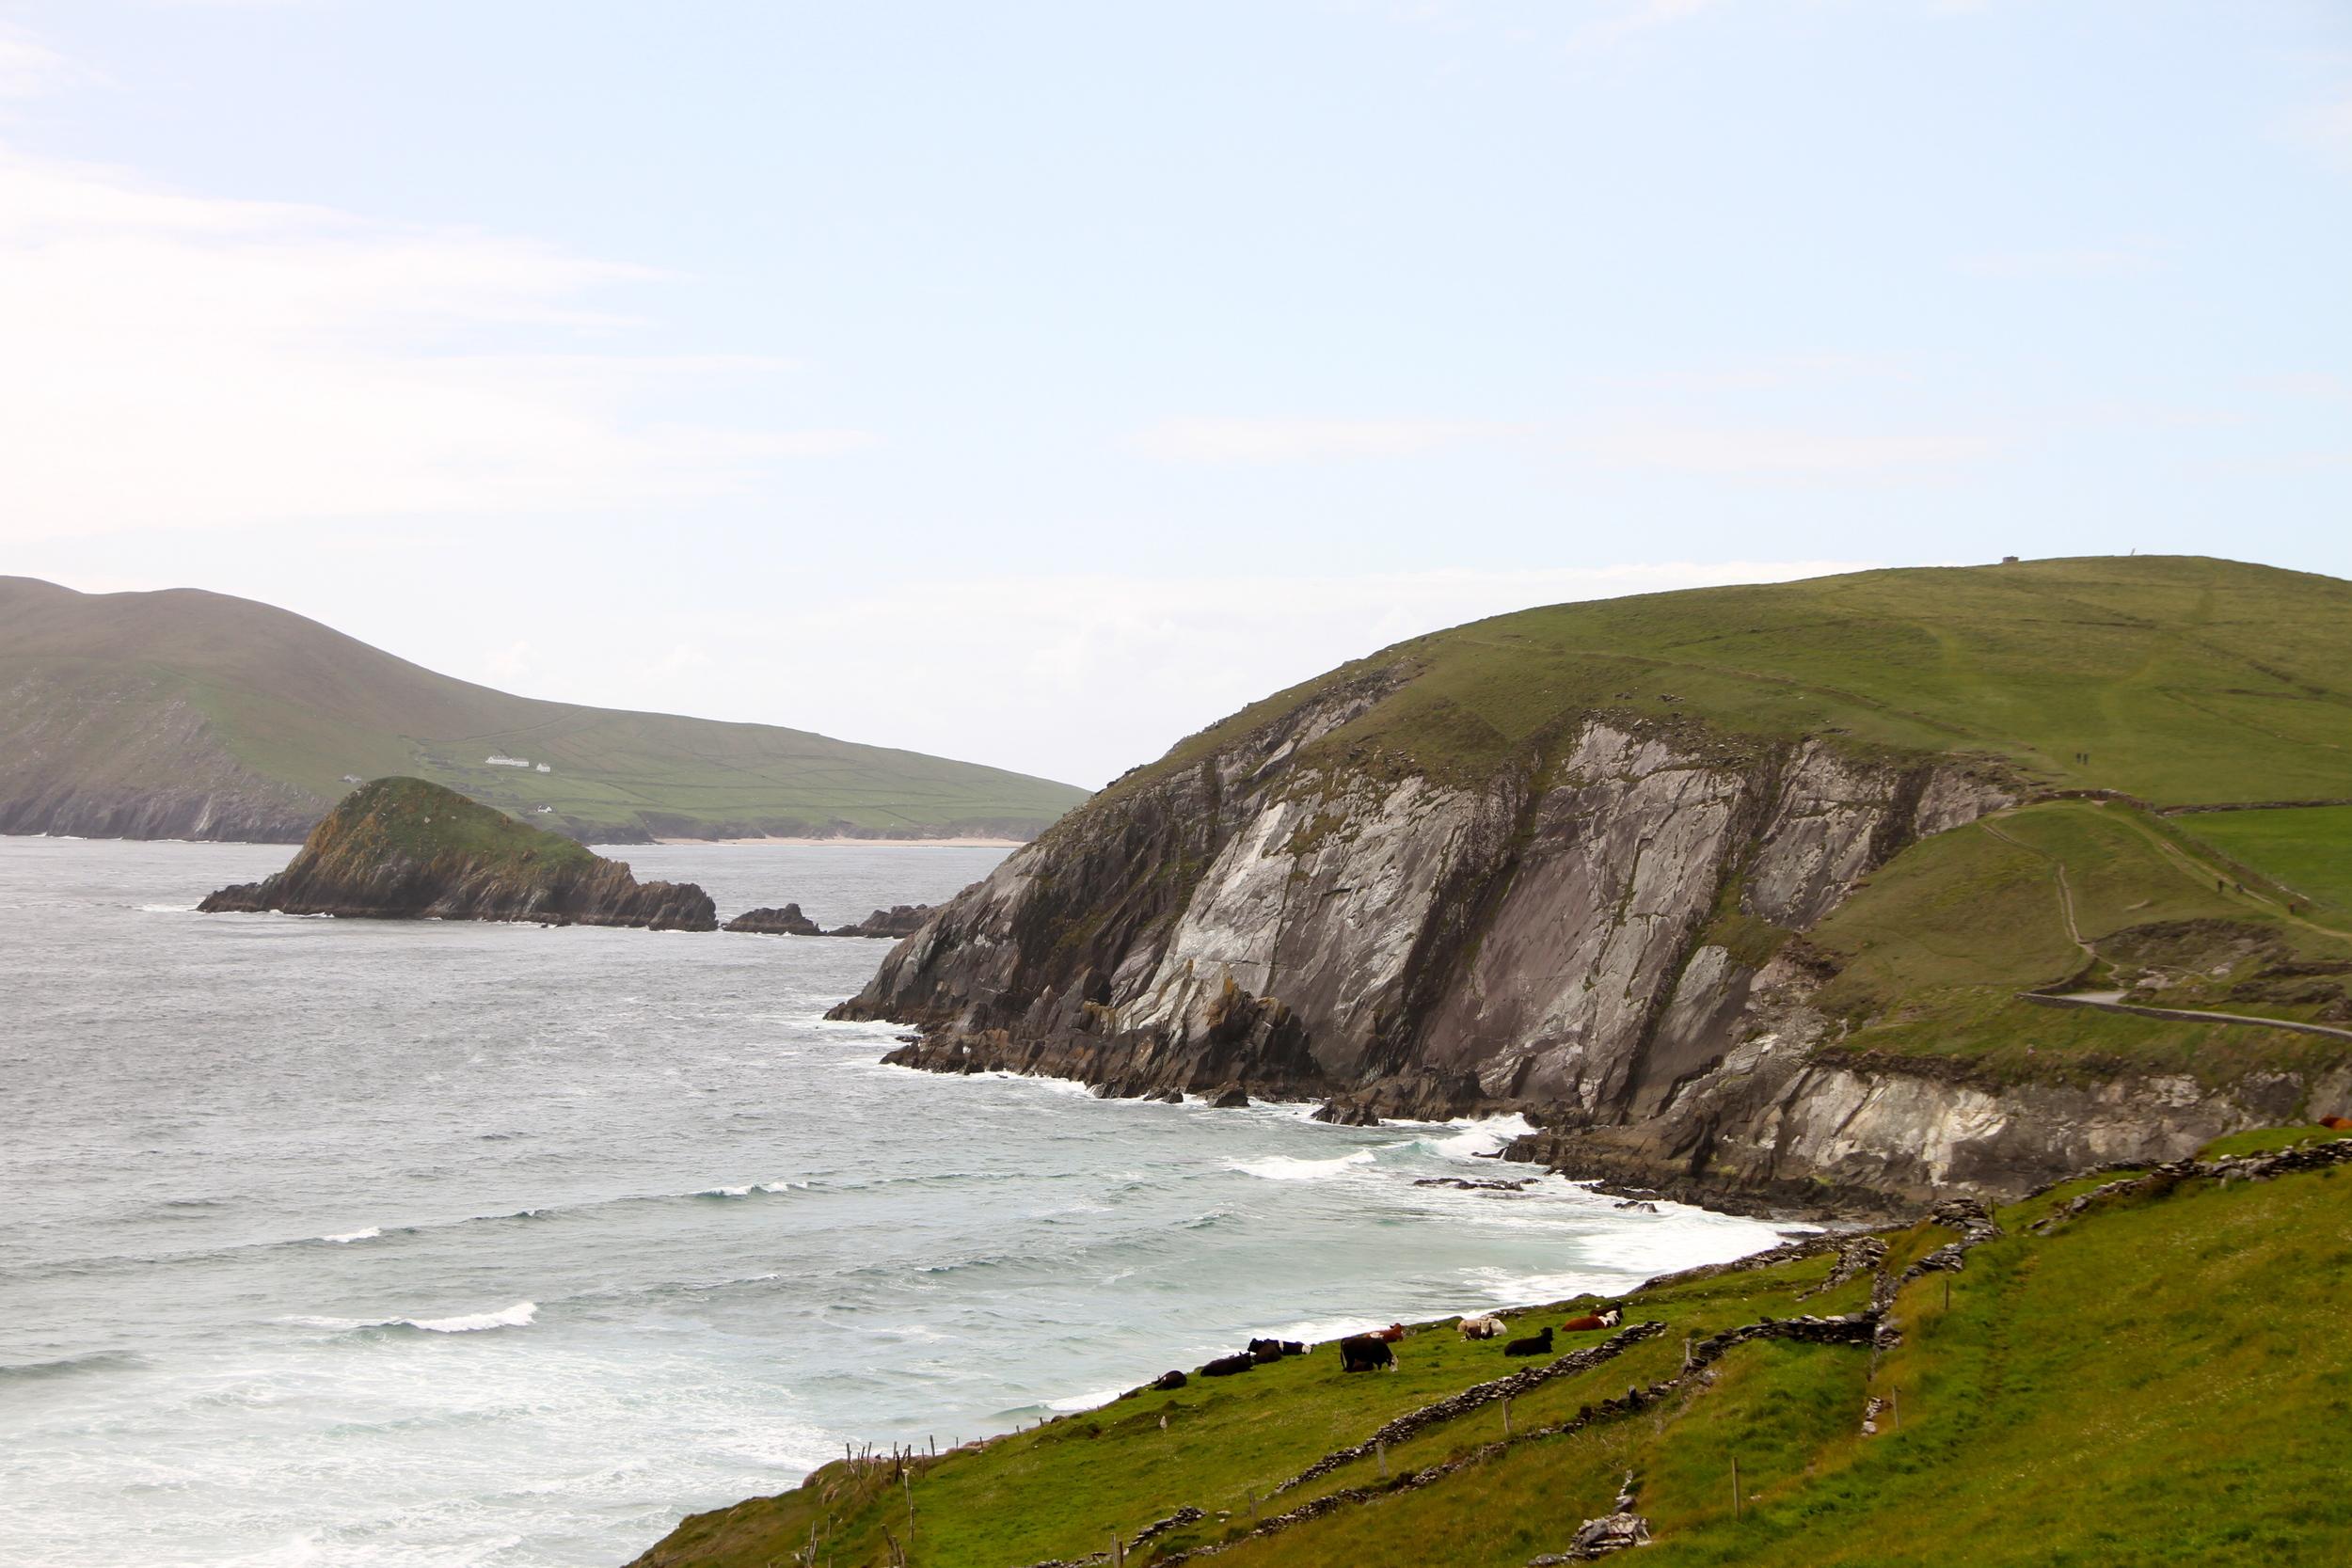 Dingle Peninsula, Co. Kerry, Ireland.